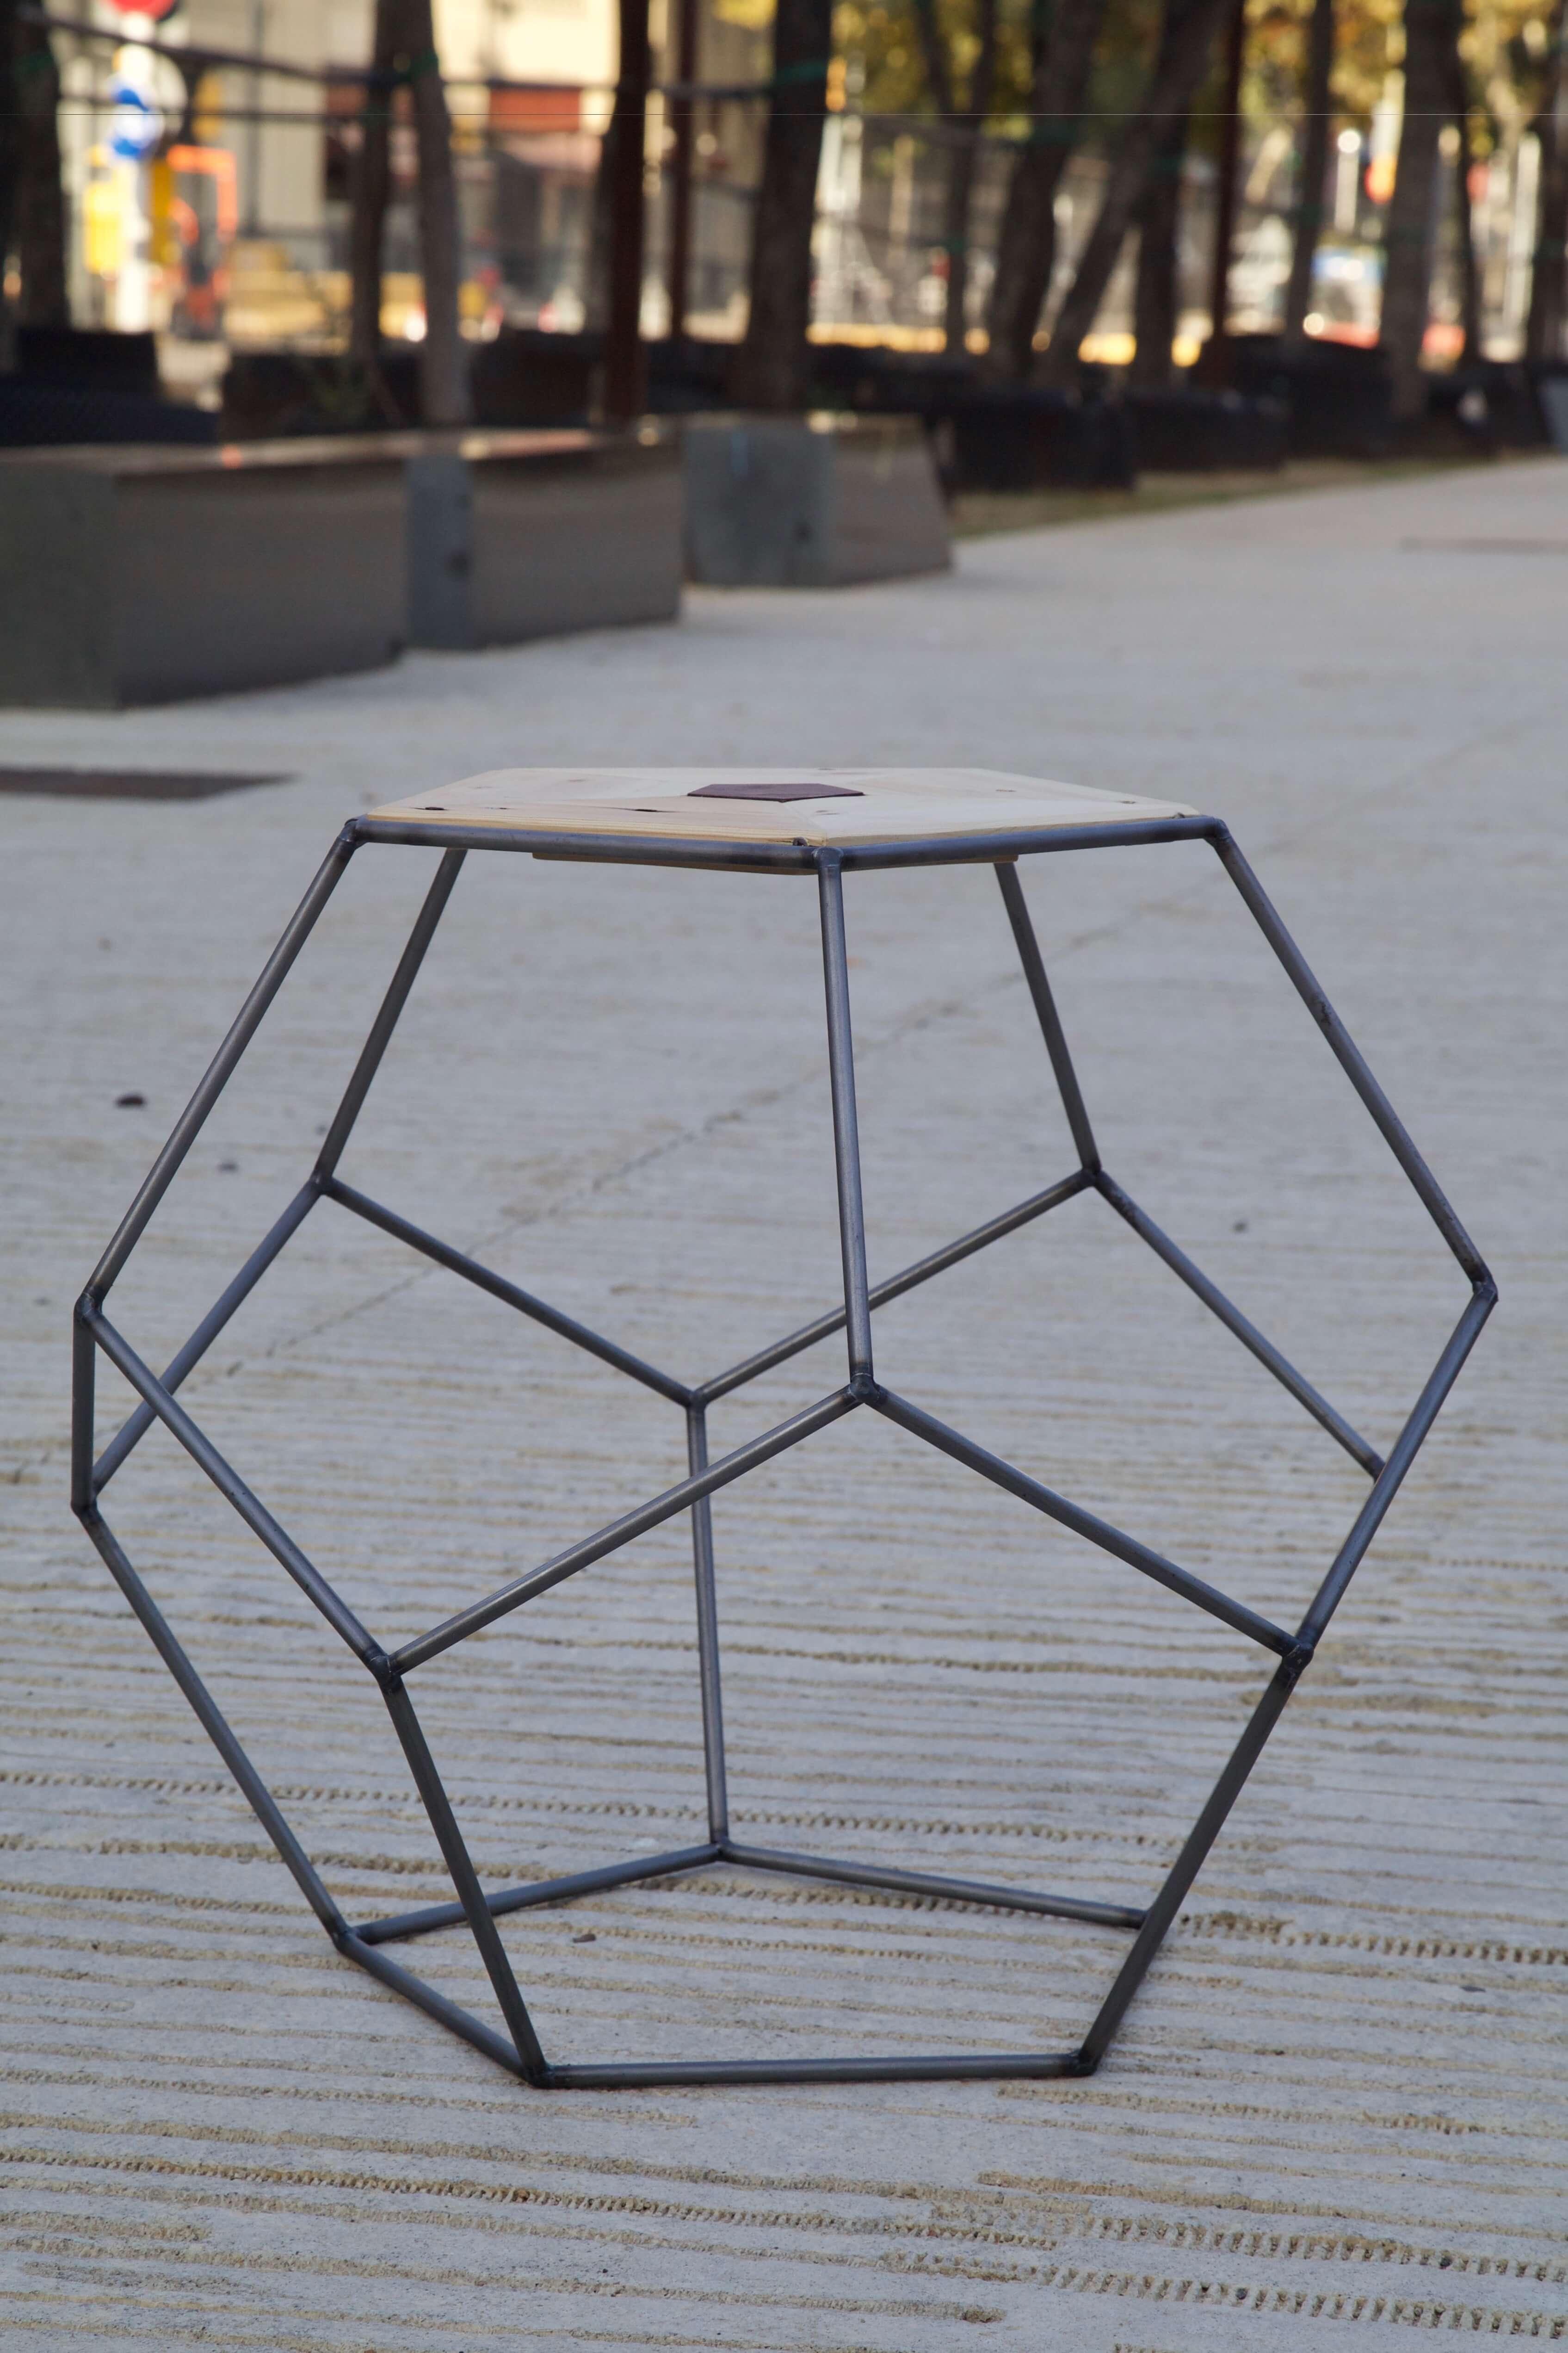 detalle horizontal de la mesa pentagonal hecha con palets